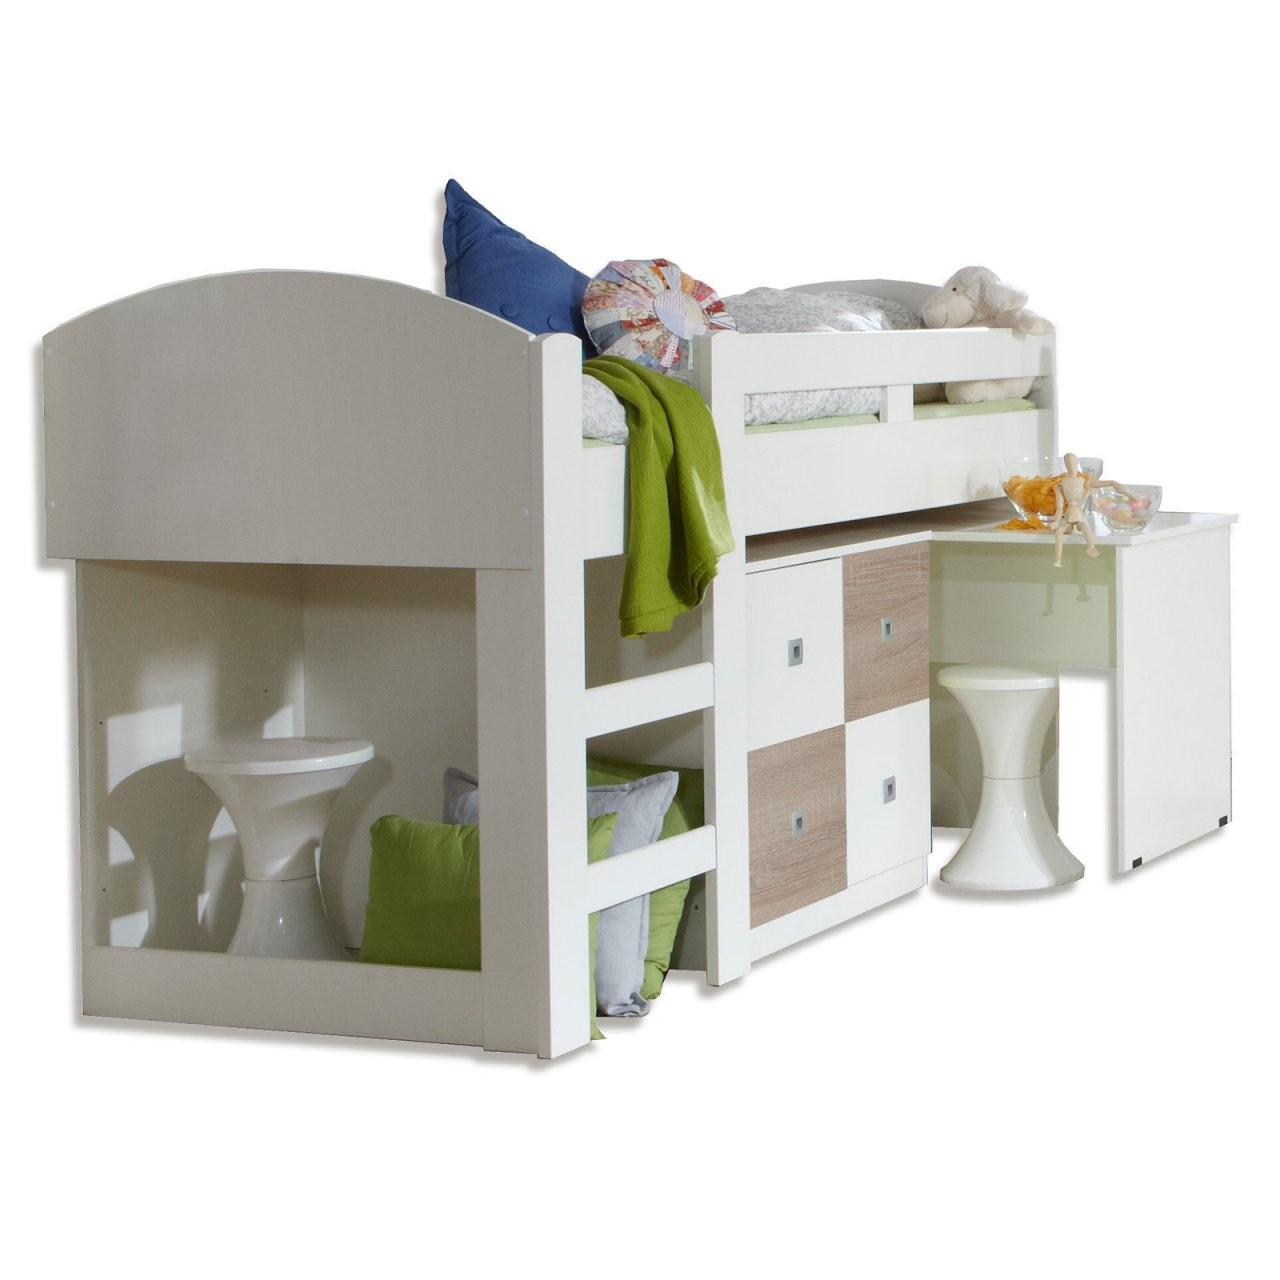 Halbhohes Kinderbett Mit Treppe Perfect Genial Hochbett Treppe von Halbhohes Kinderbett Mit Treppe Bild